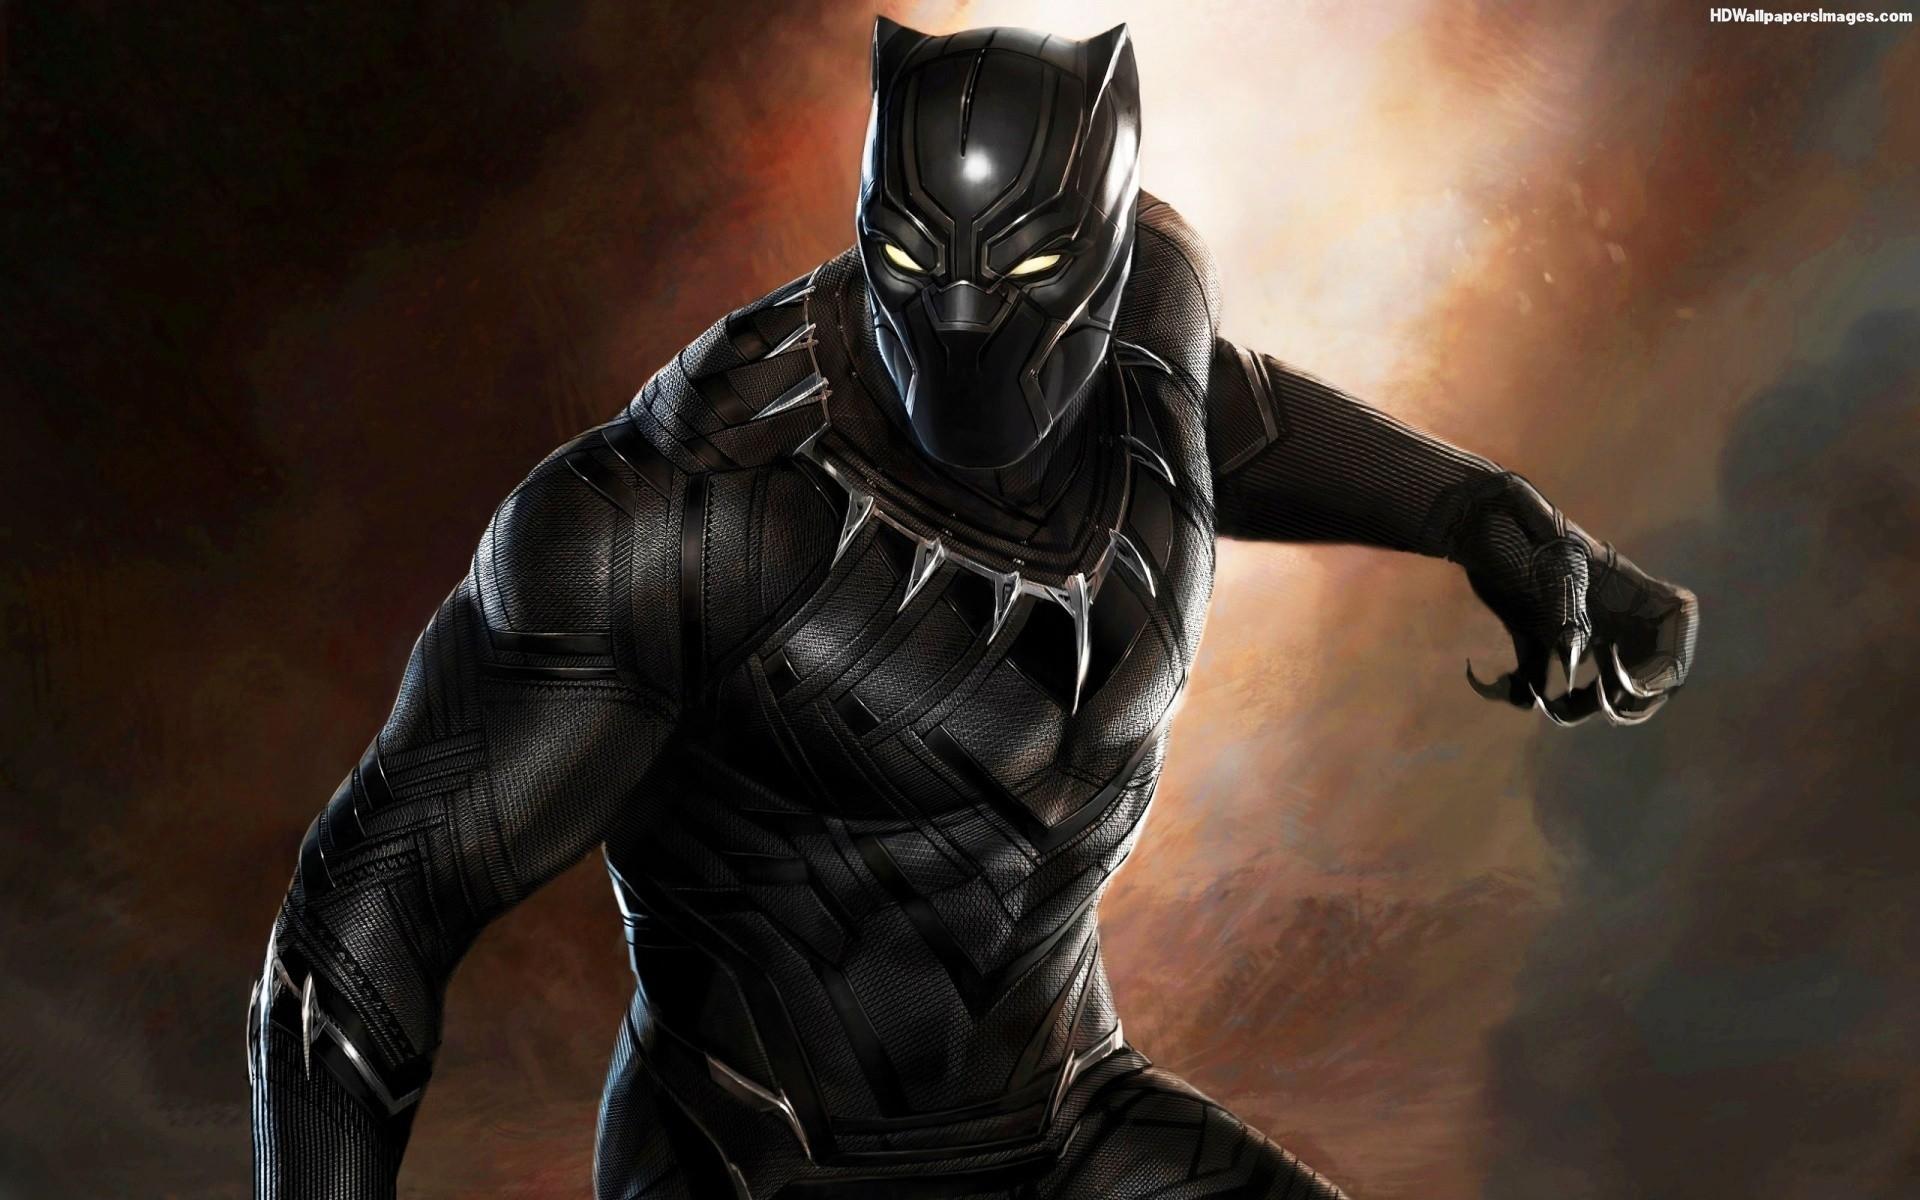 black panther hd 1920x1200